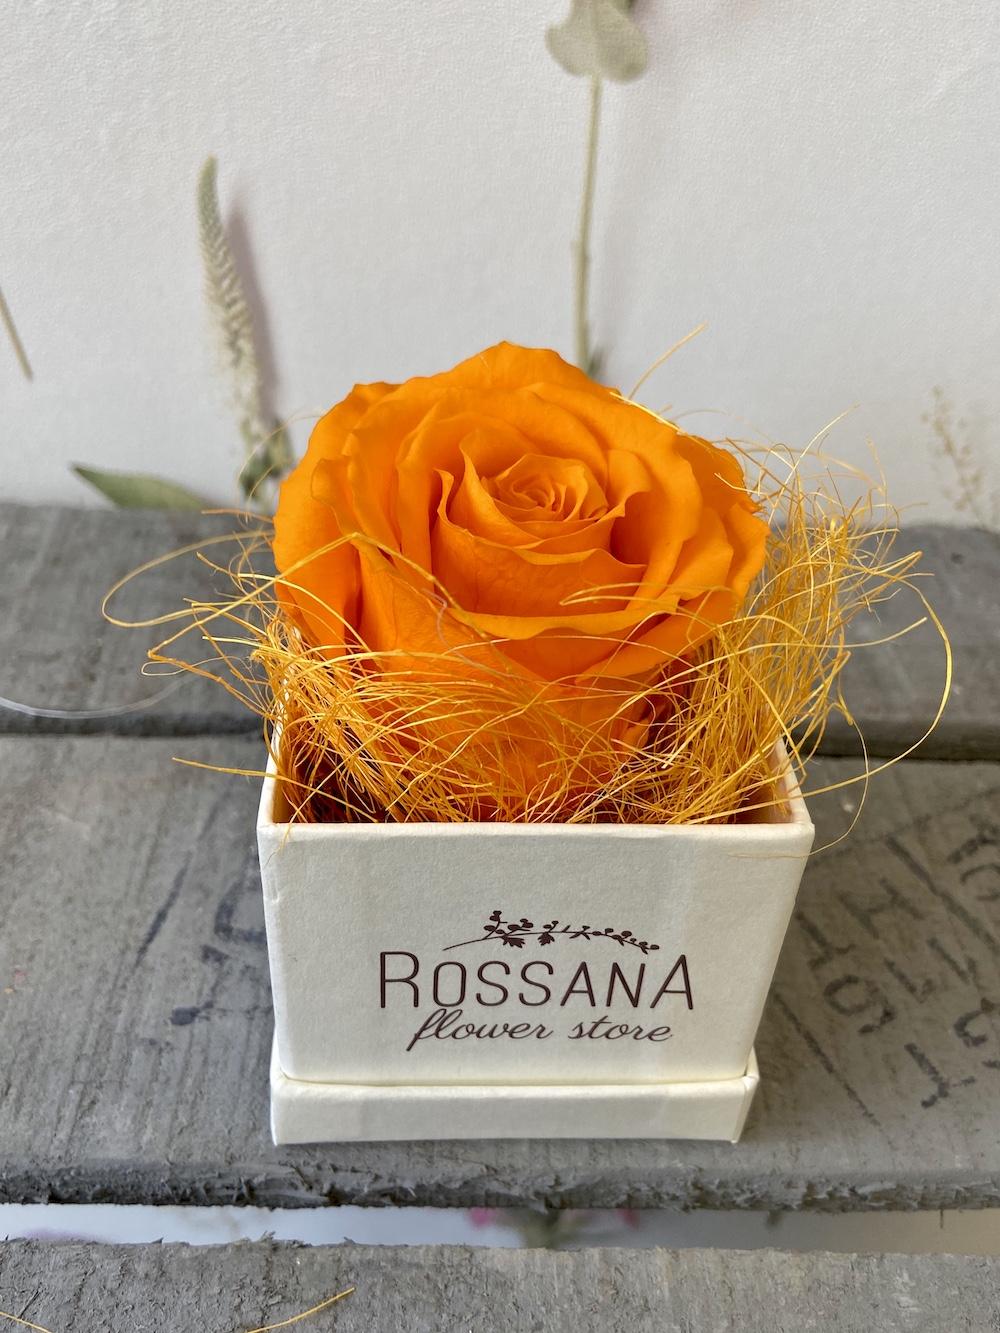 arancioflower box rose stabilizzate florashopping Rossana flower store NovellinoIMG_0472